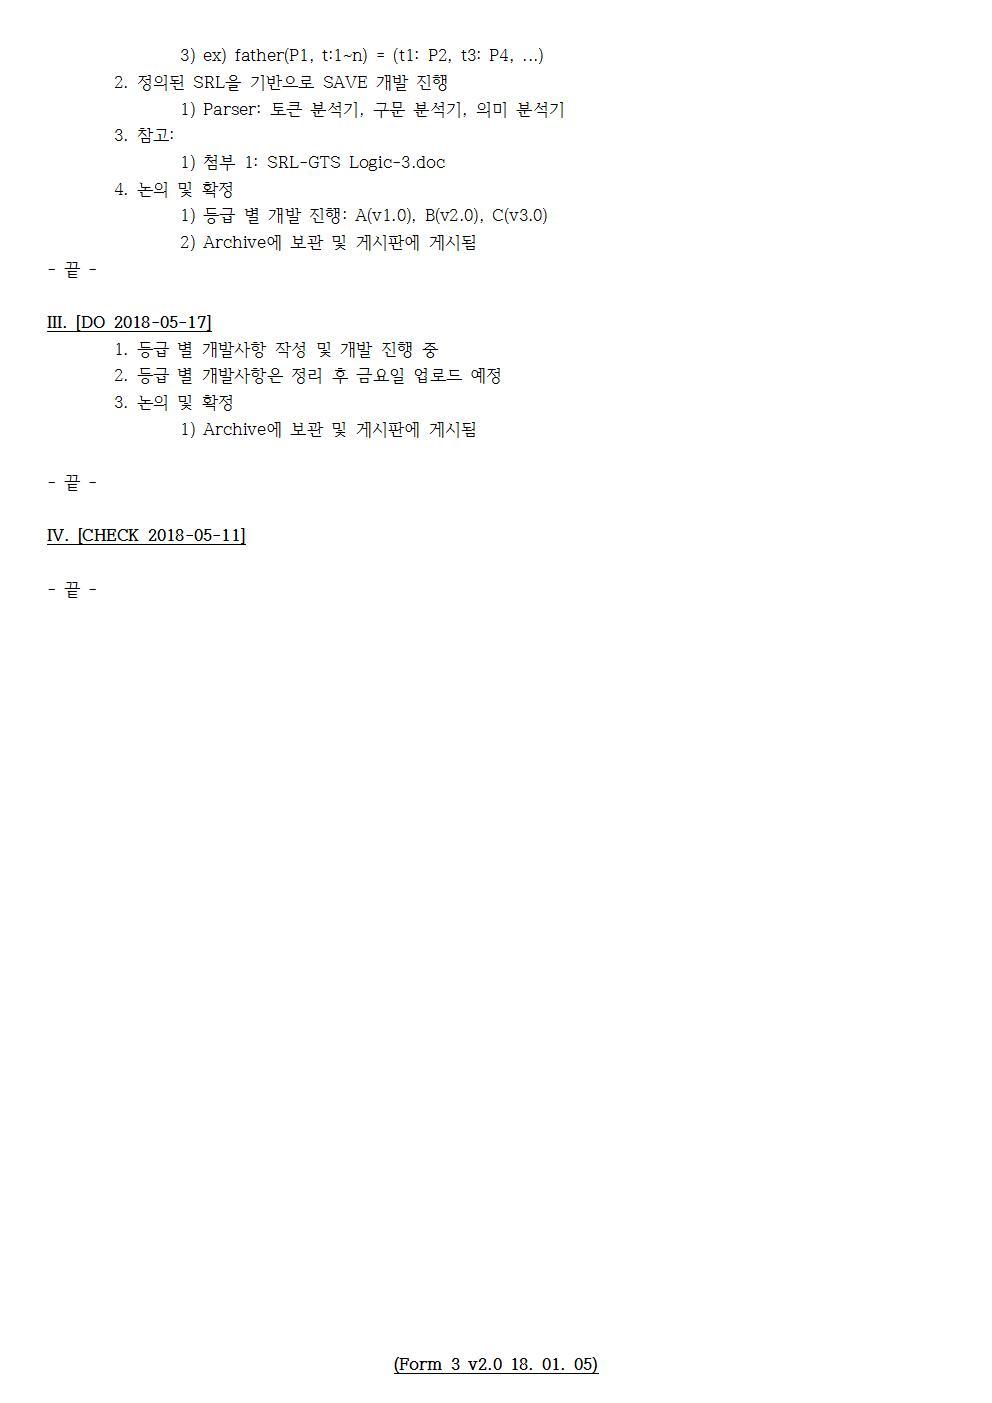 D-[18-001-RD-01]-[SAVE 3.0]-[2018-05-17][SH]002.jpg